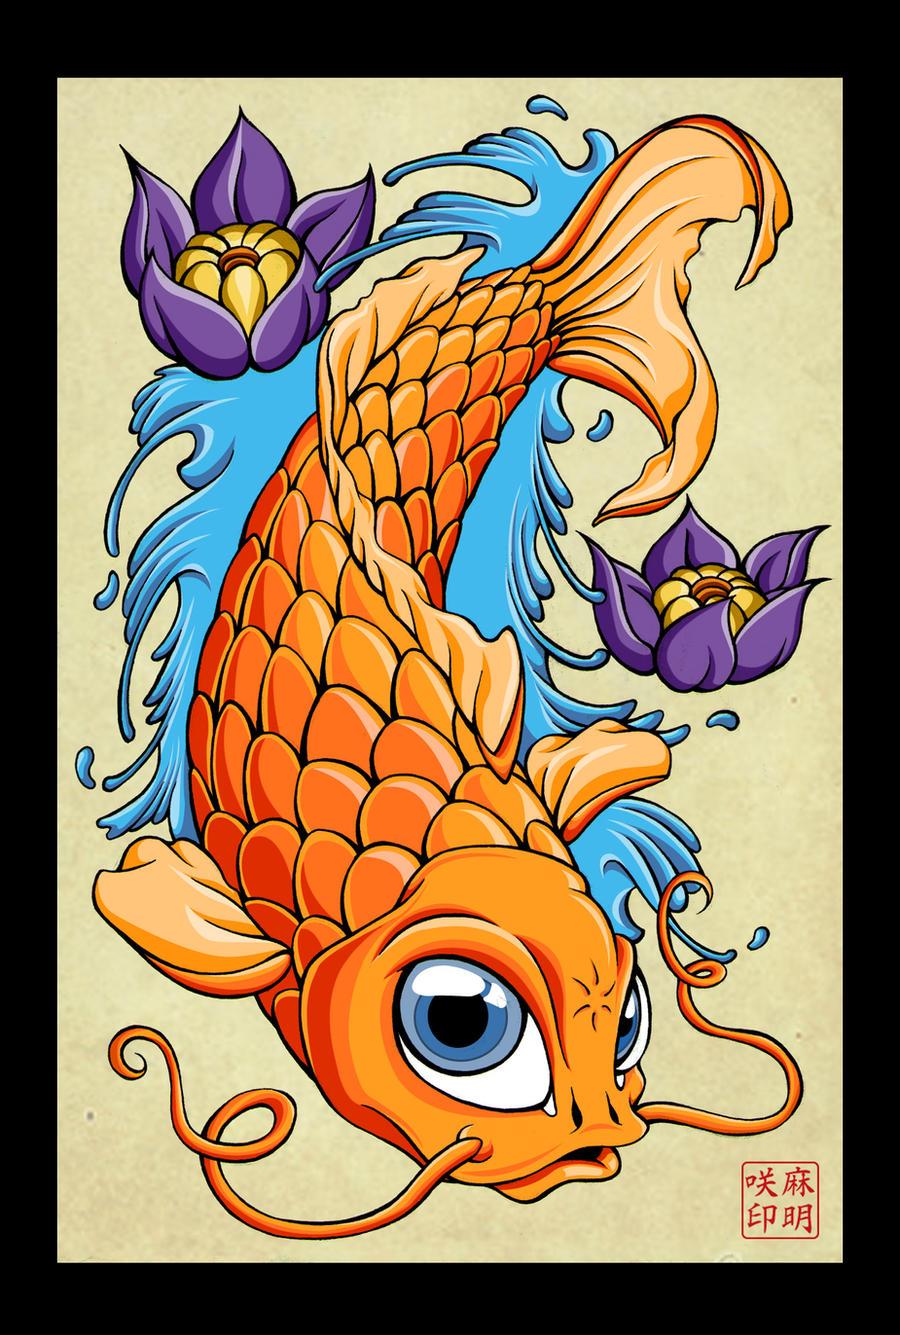 Tattoo Pez Koi. Orange Fish Tattoo. Tattoo Pez Koi. Beautiful Koi ...